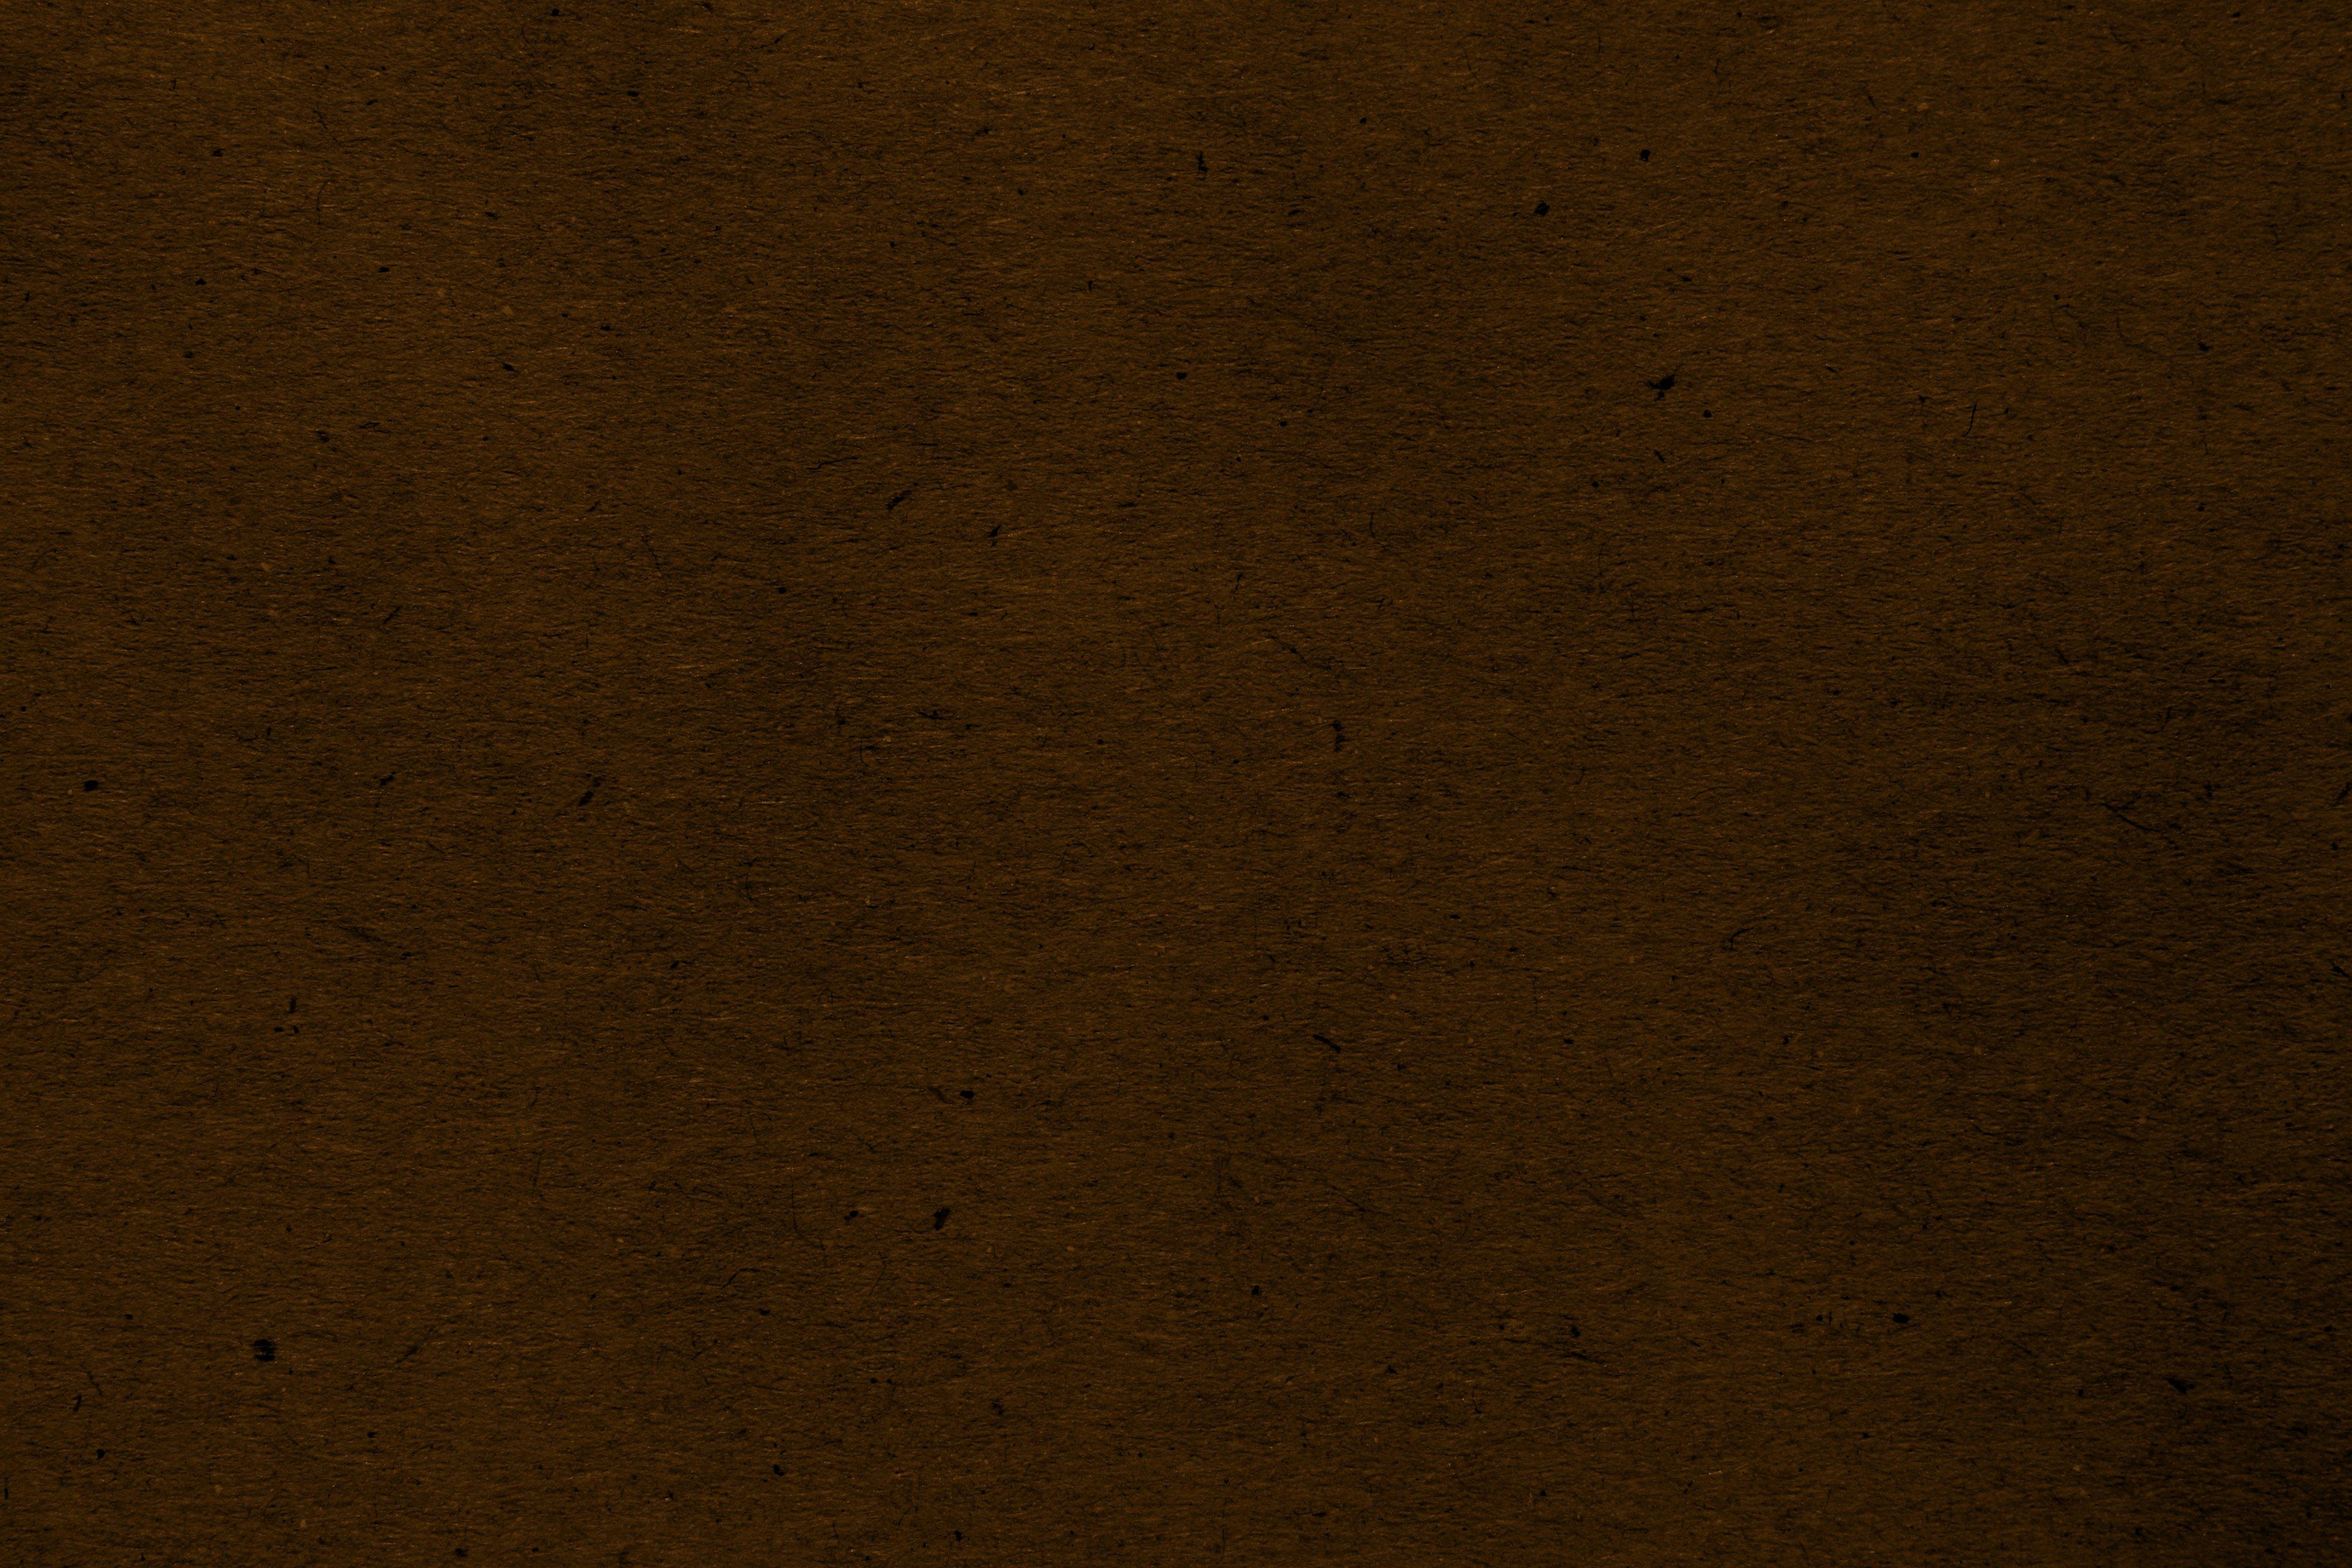 Chocolate Brown Wallpaper 23 Background Wallpaper   Hivewallpapercom 3888x2592